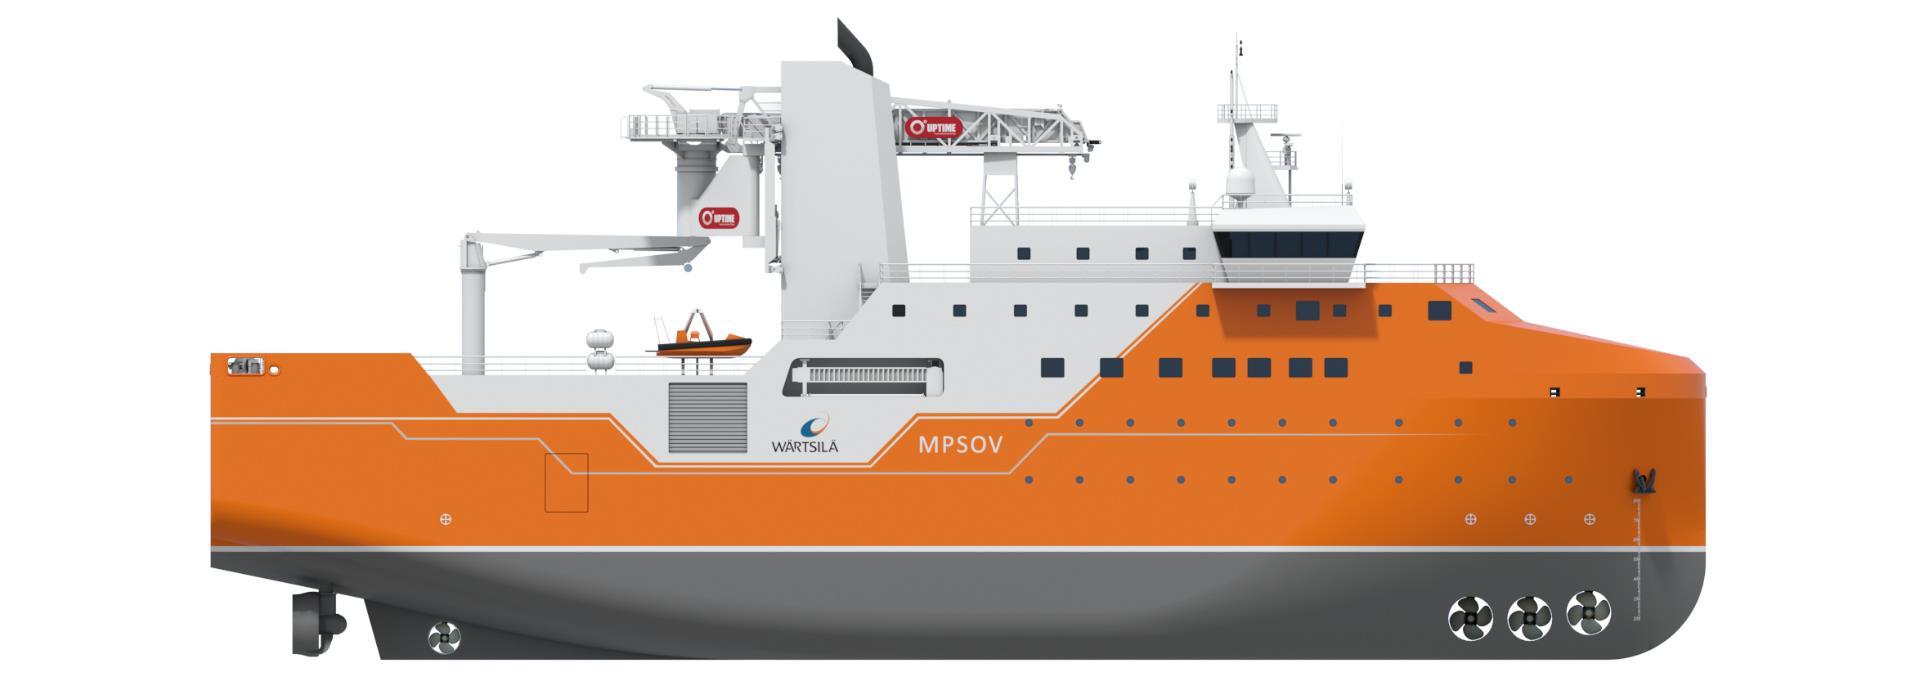 Wärtsilä Designs Multi-Purpose SOV for US Offshore Wind Market